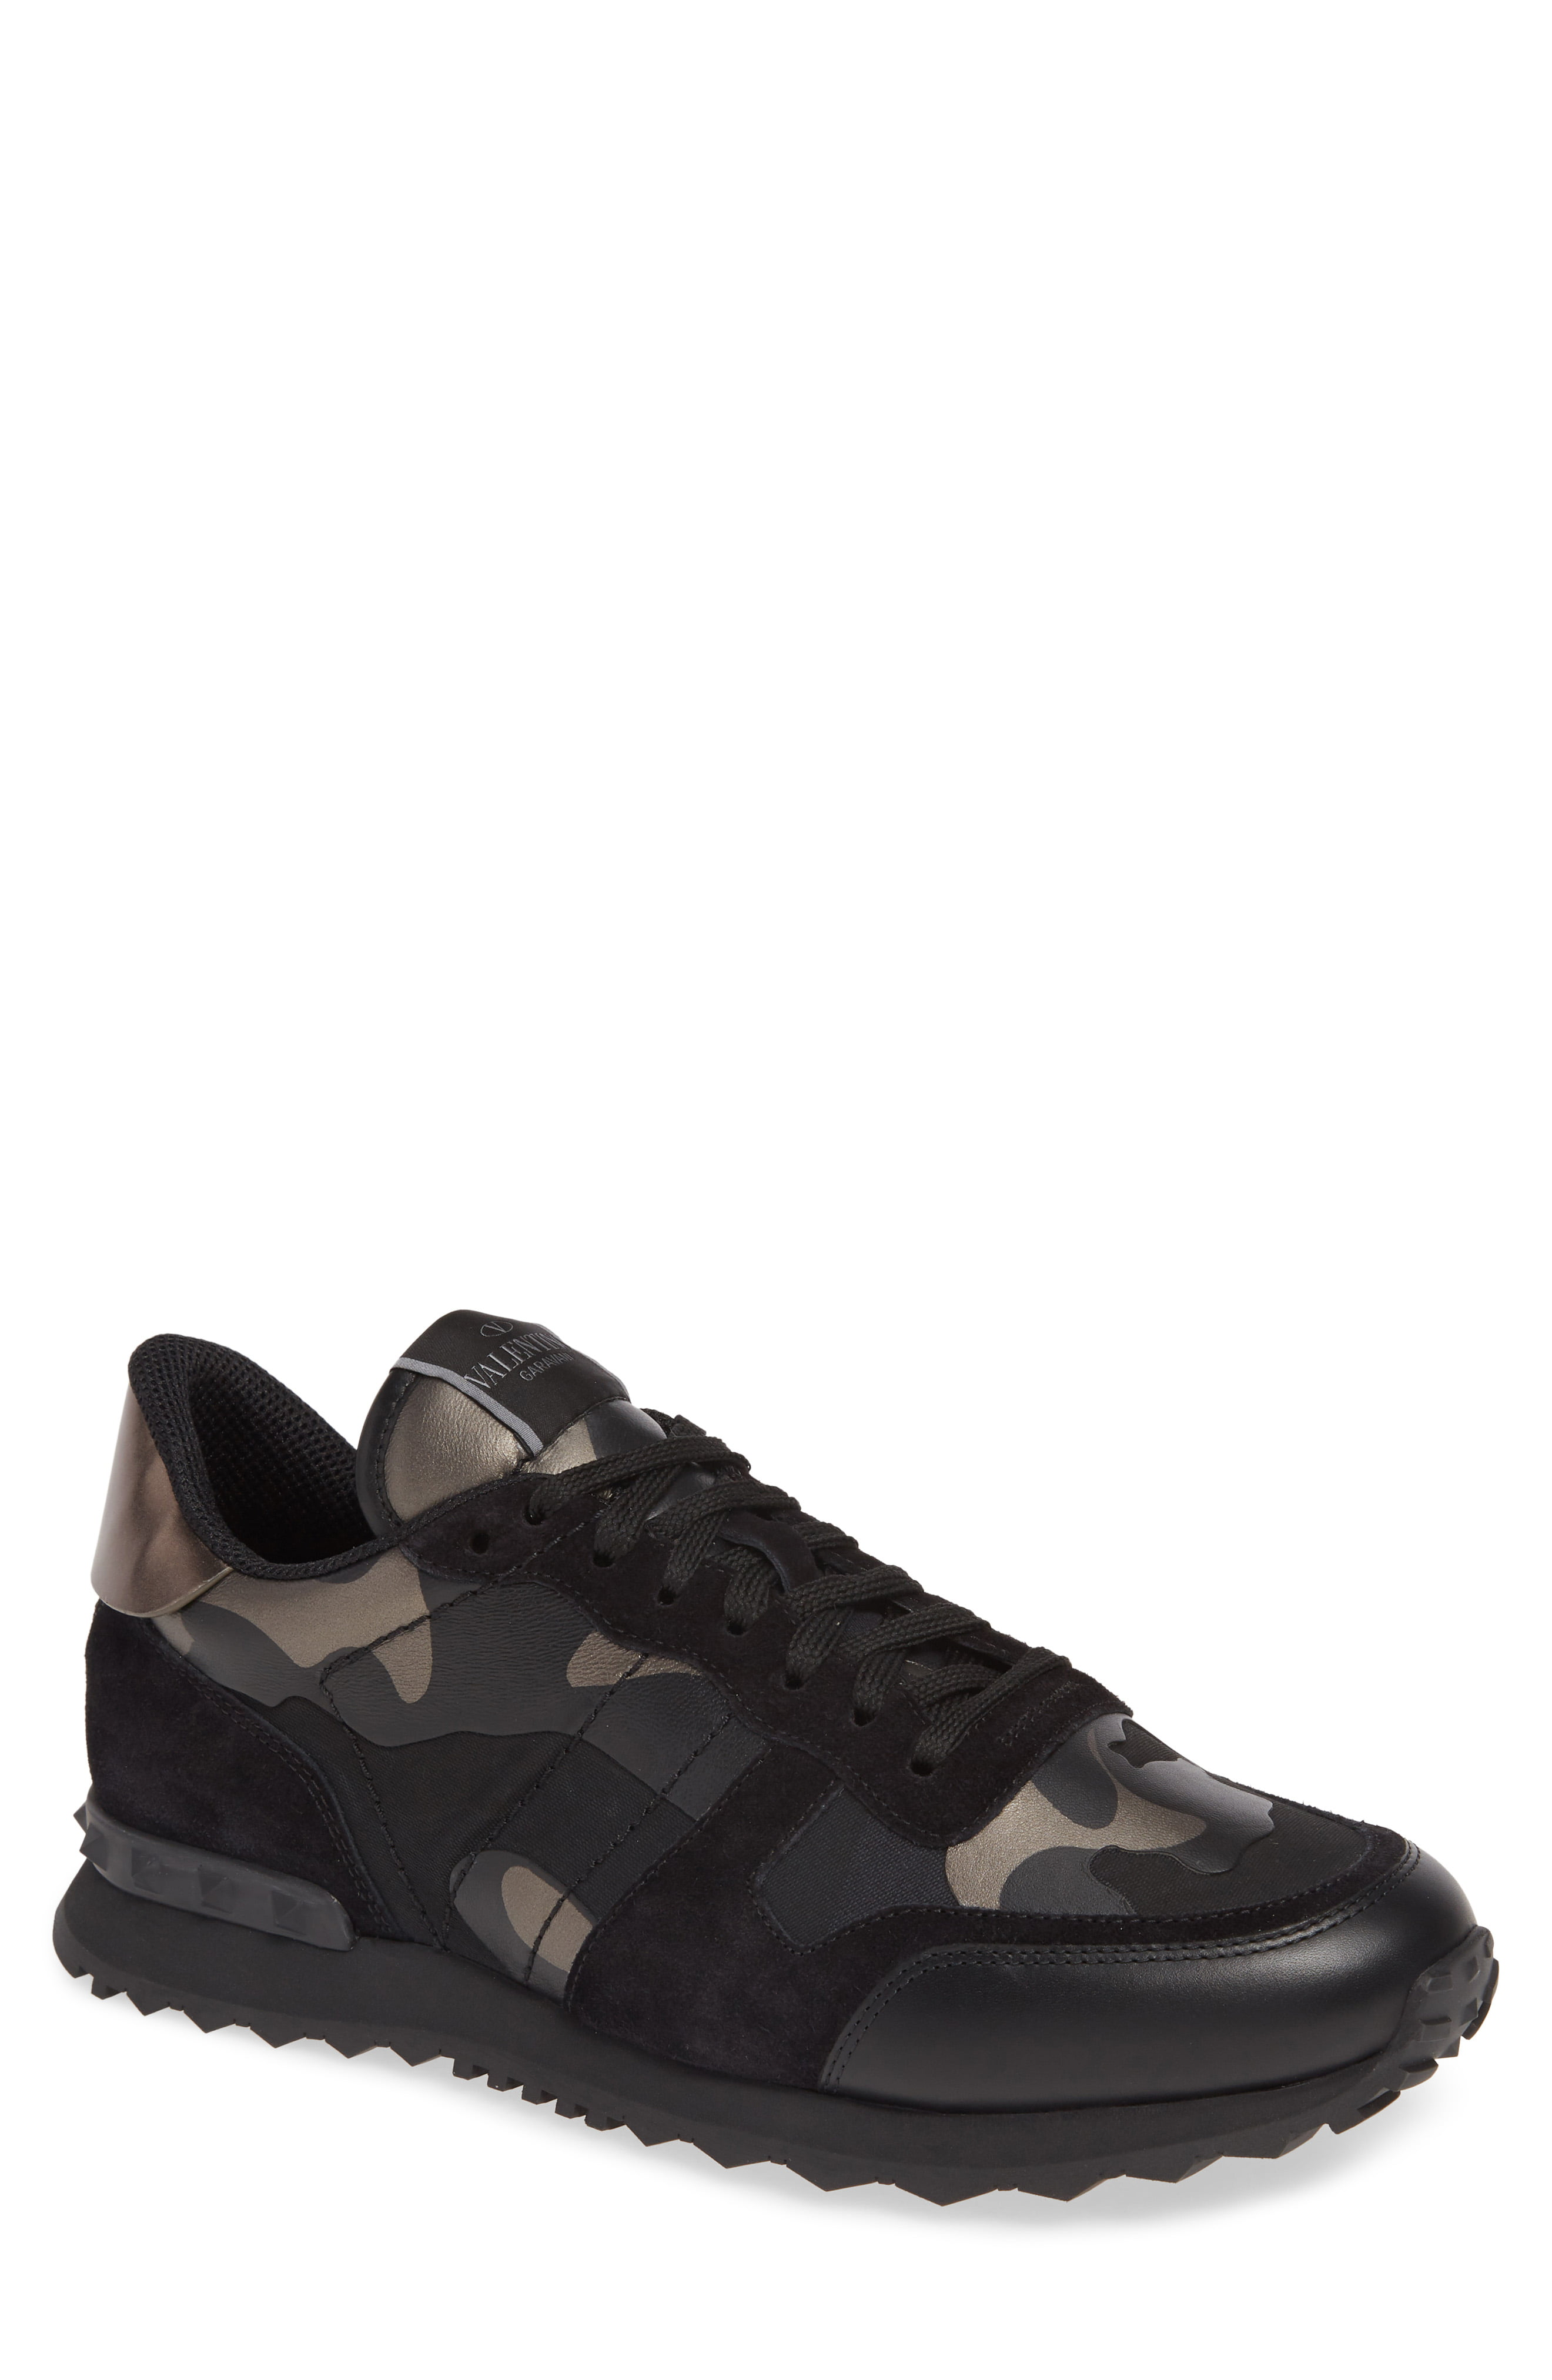 a70b0cf0a18ae Men's Valentino Garavani Camo Rockrunner Sneaker, Size 11US / 44EU – Black